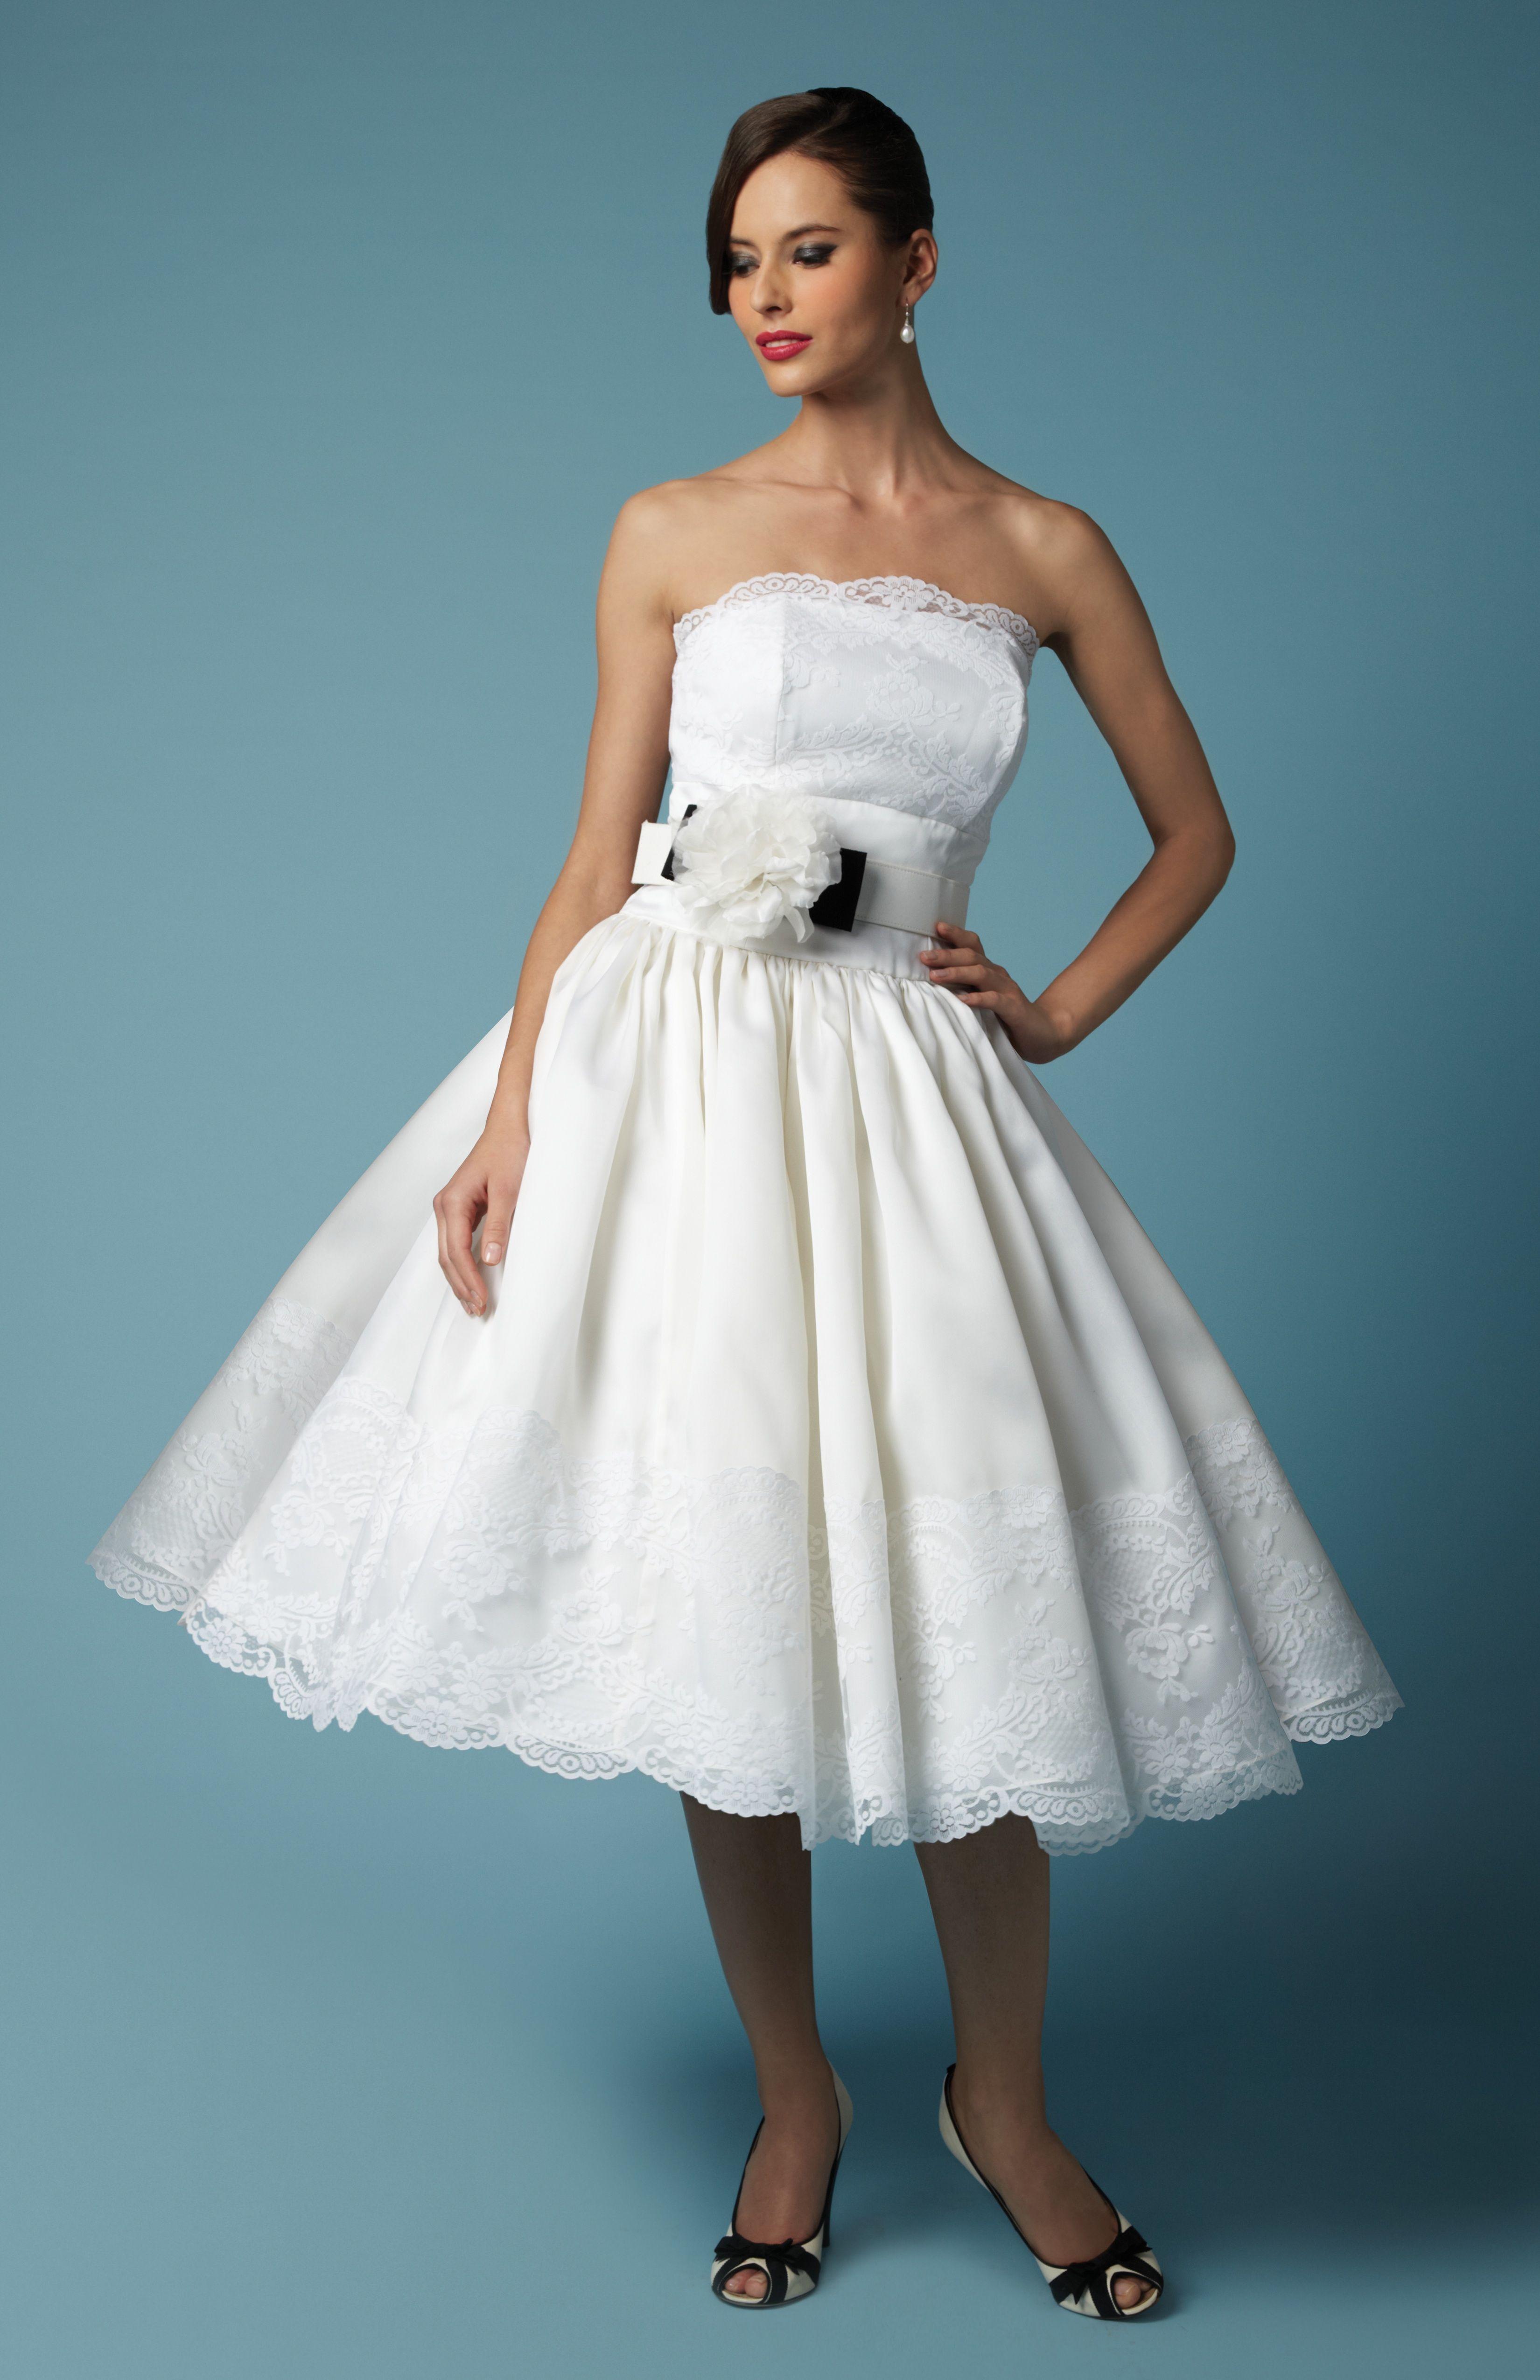 Fancy New York brings a little Joy to a garden wedding | Wedding ...